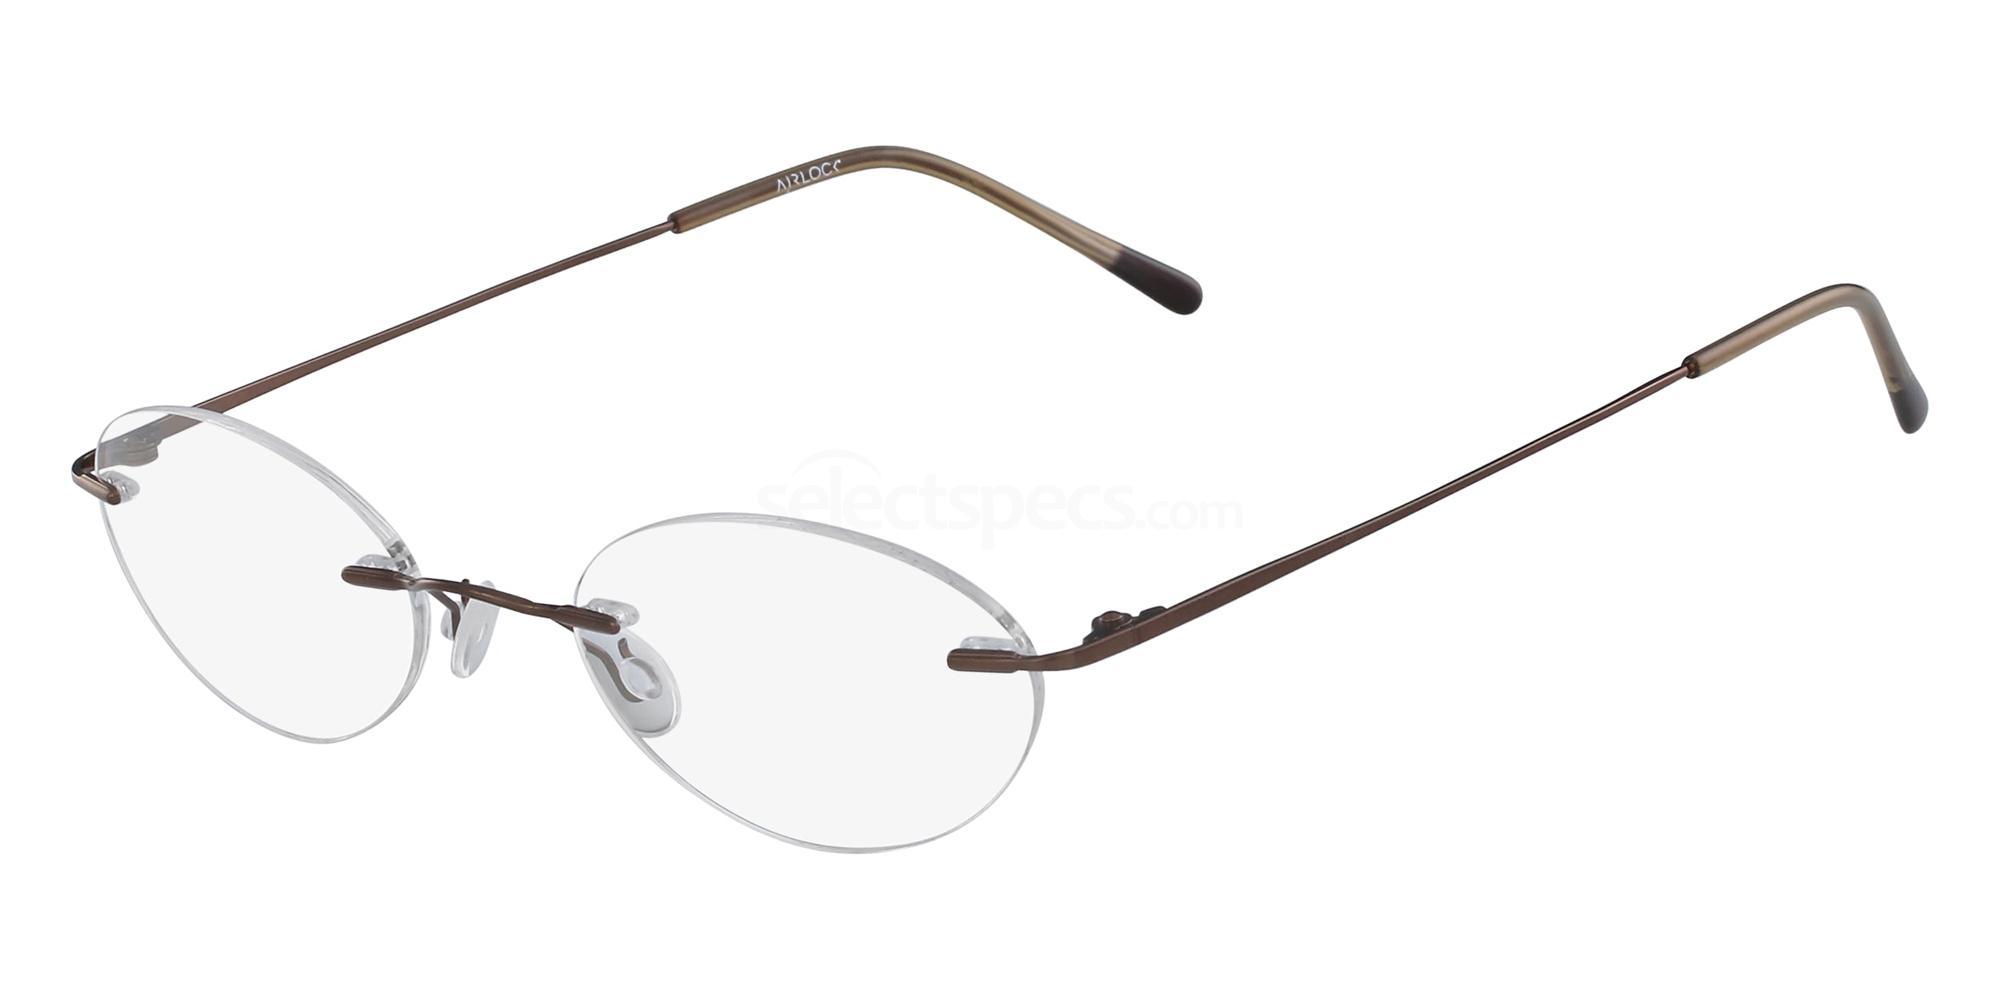 210 SEVEN-SIXTY 204 Glasses, AIRLOCK